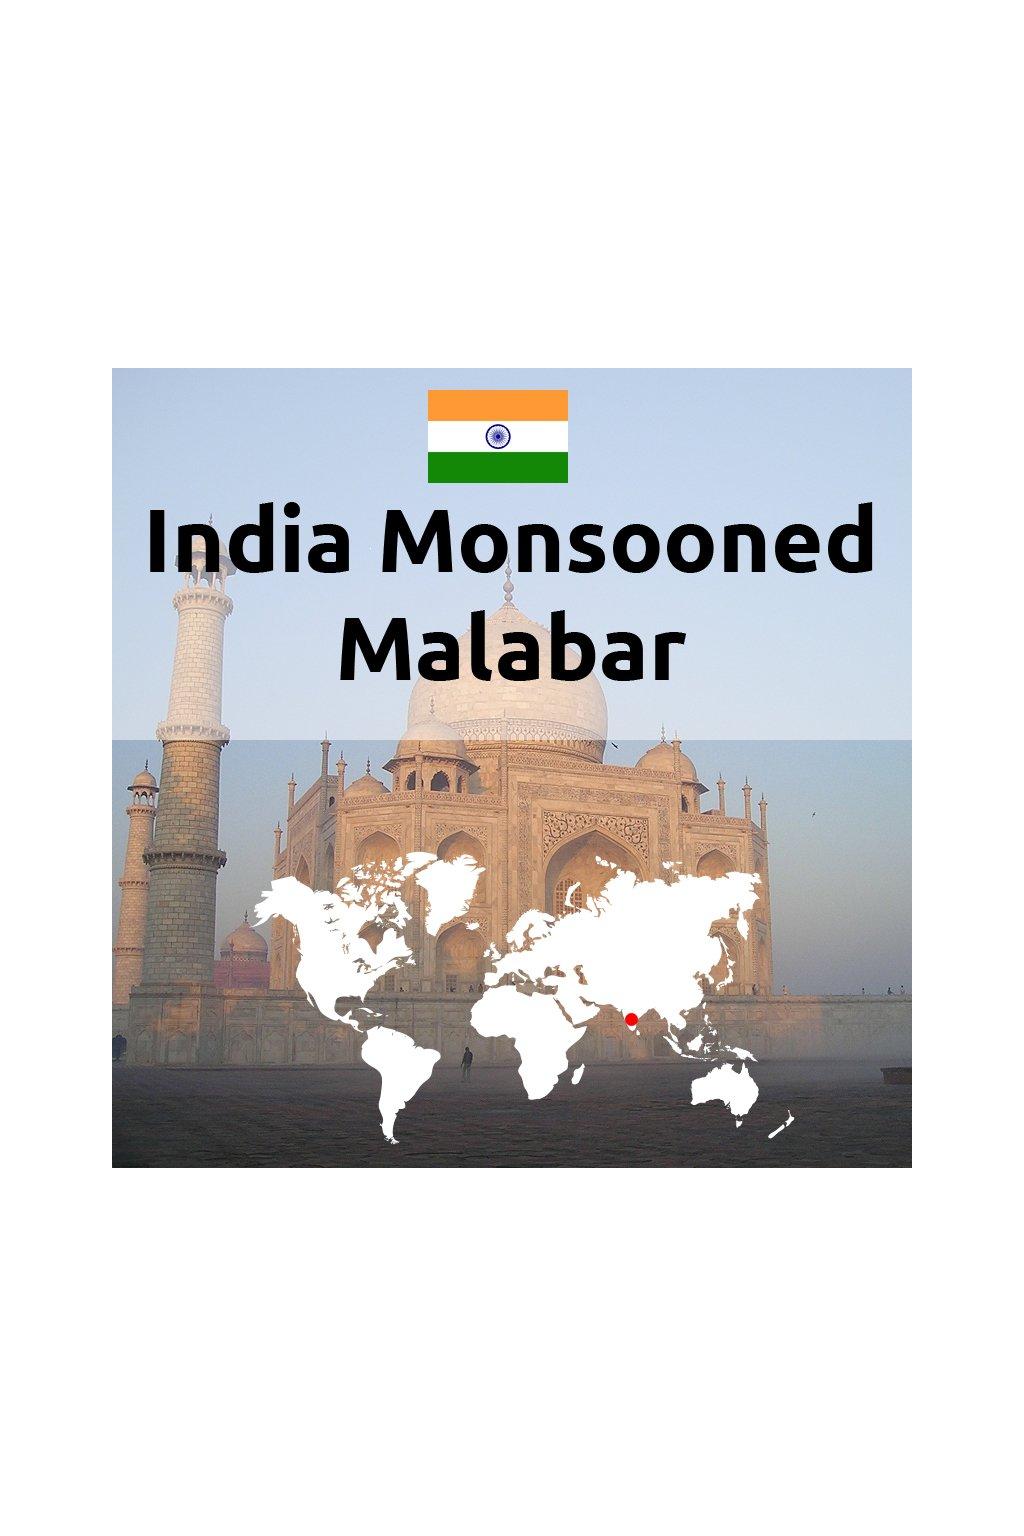 India Monsooned Malabar